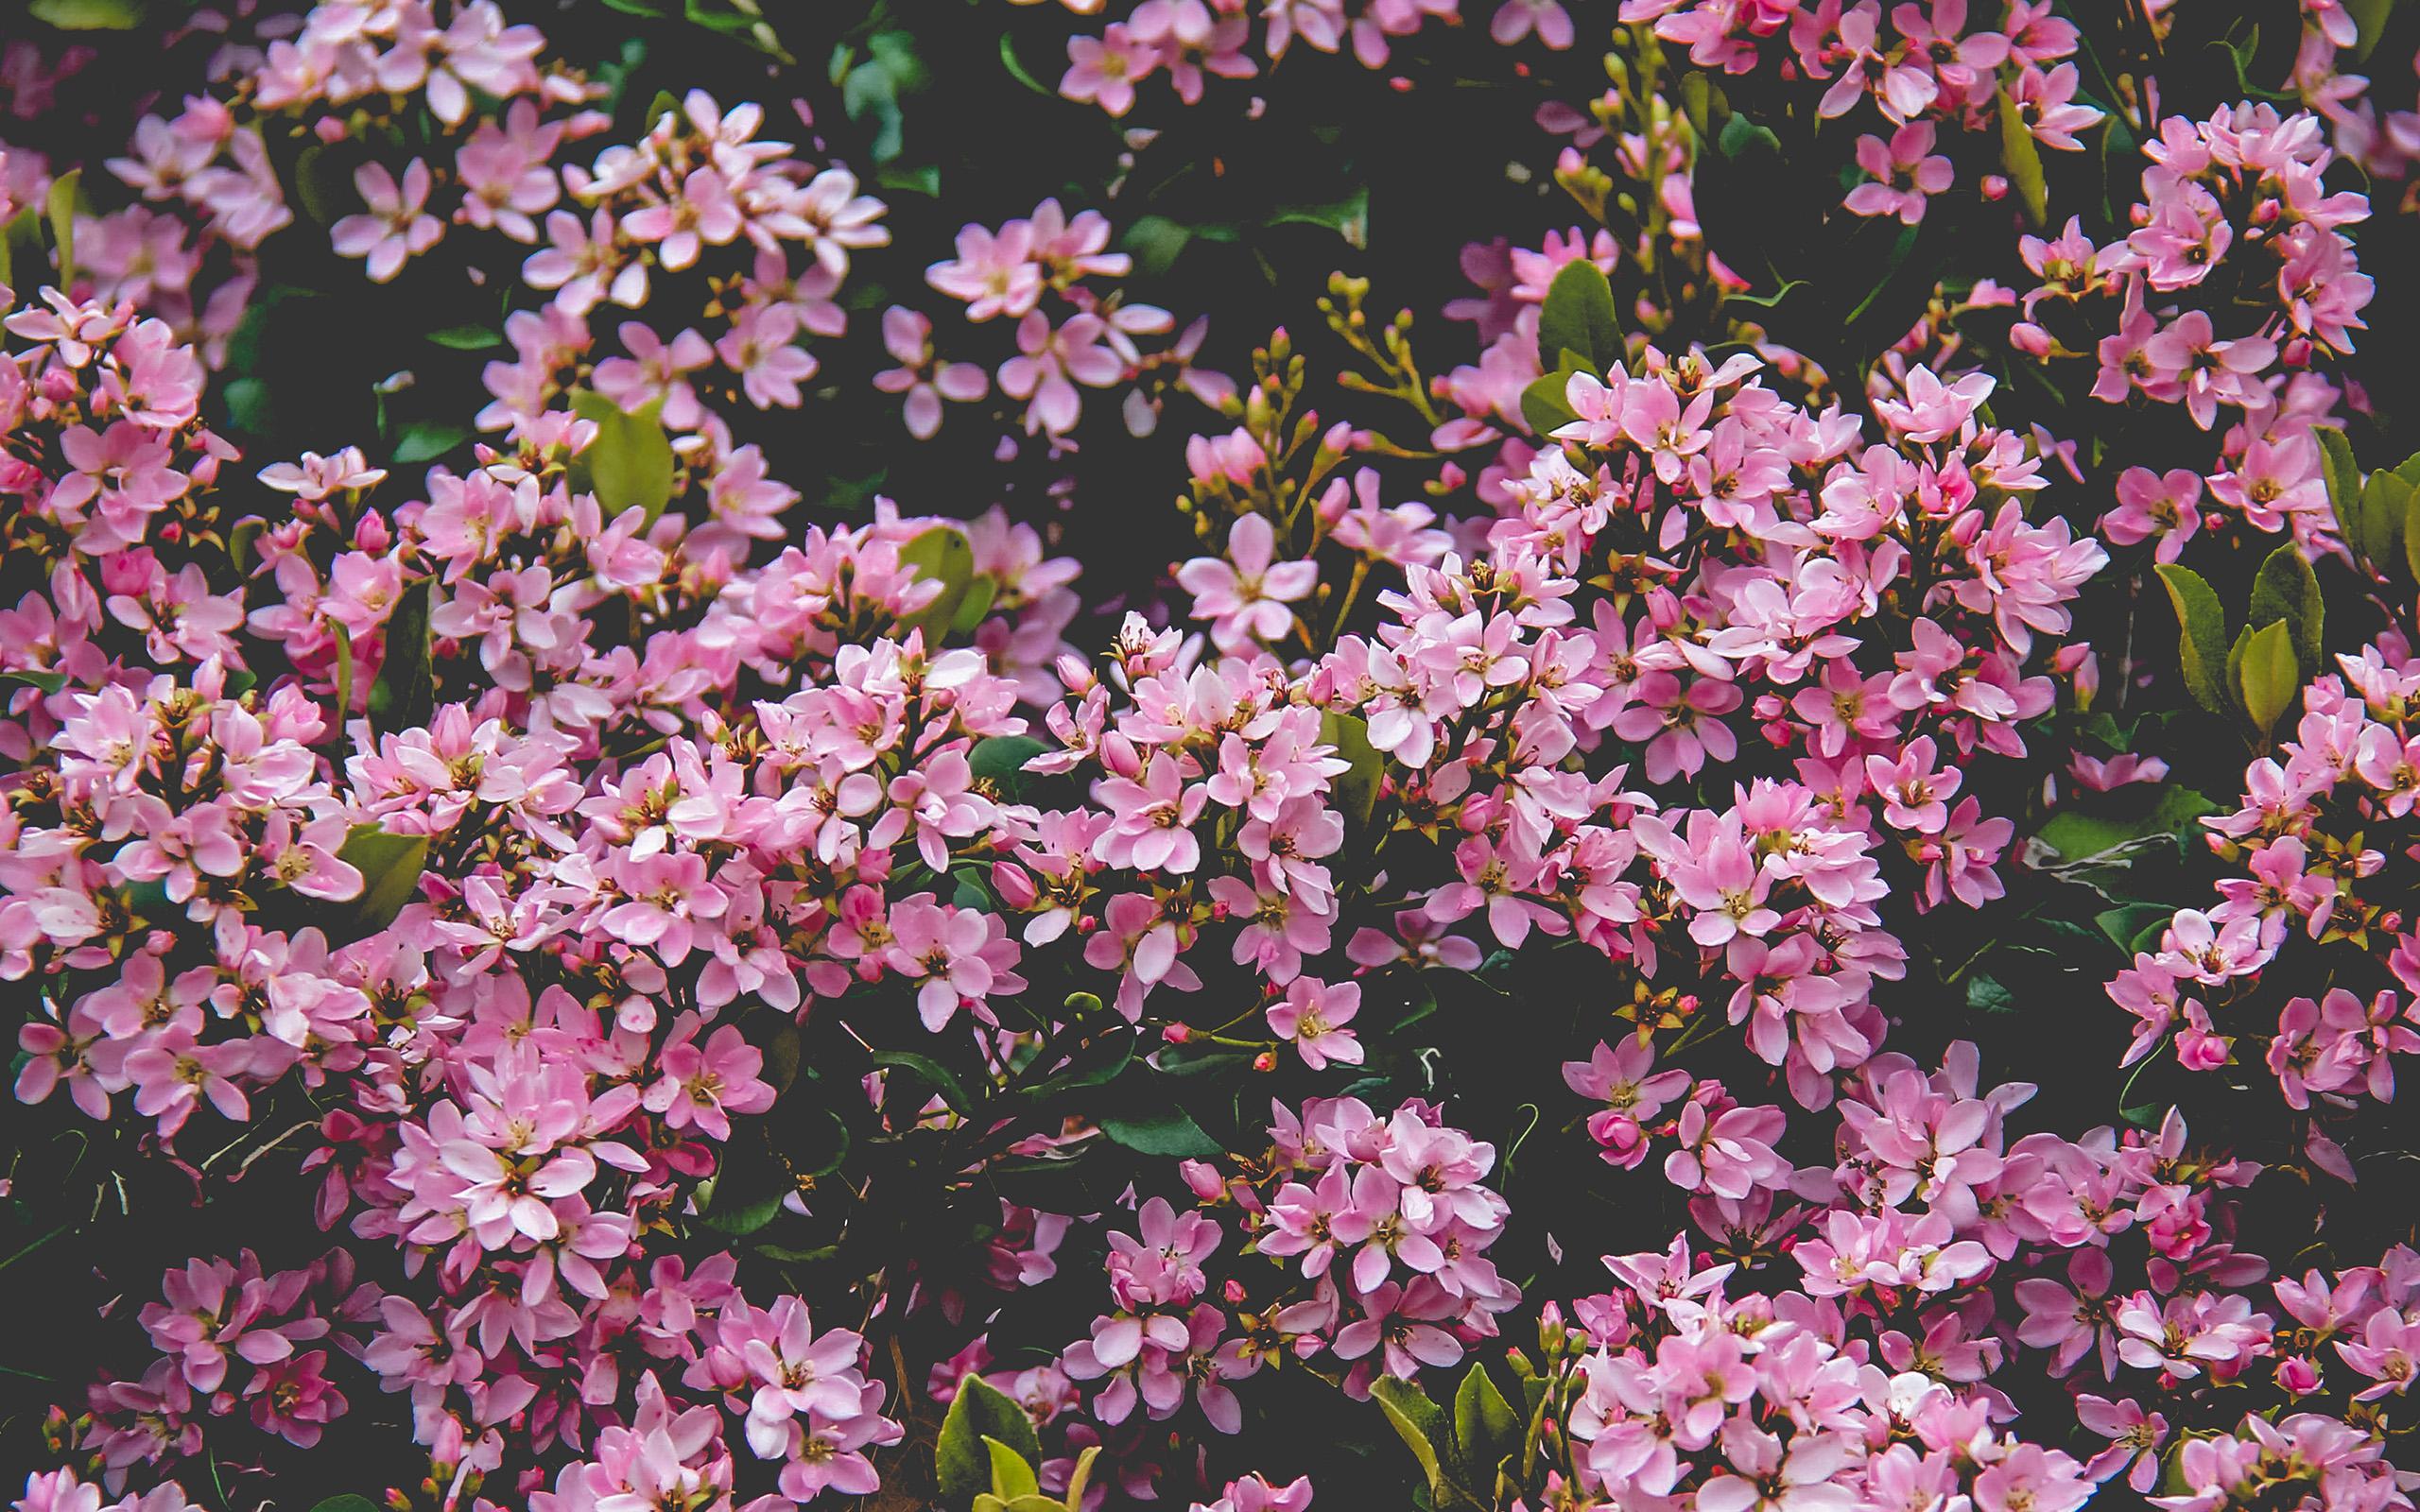 Pink Car Hd Wallpaper Nv68 Flower Pink Spring Happy Nature Wallpaper